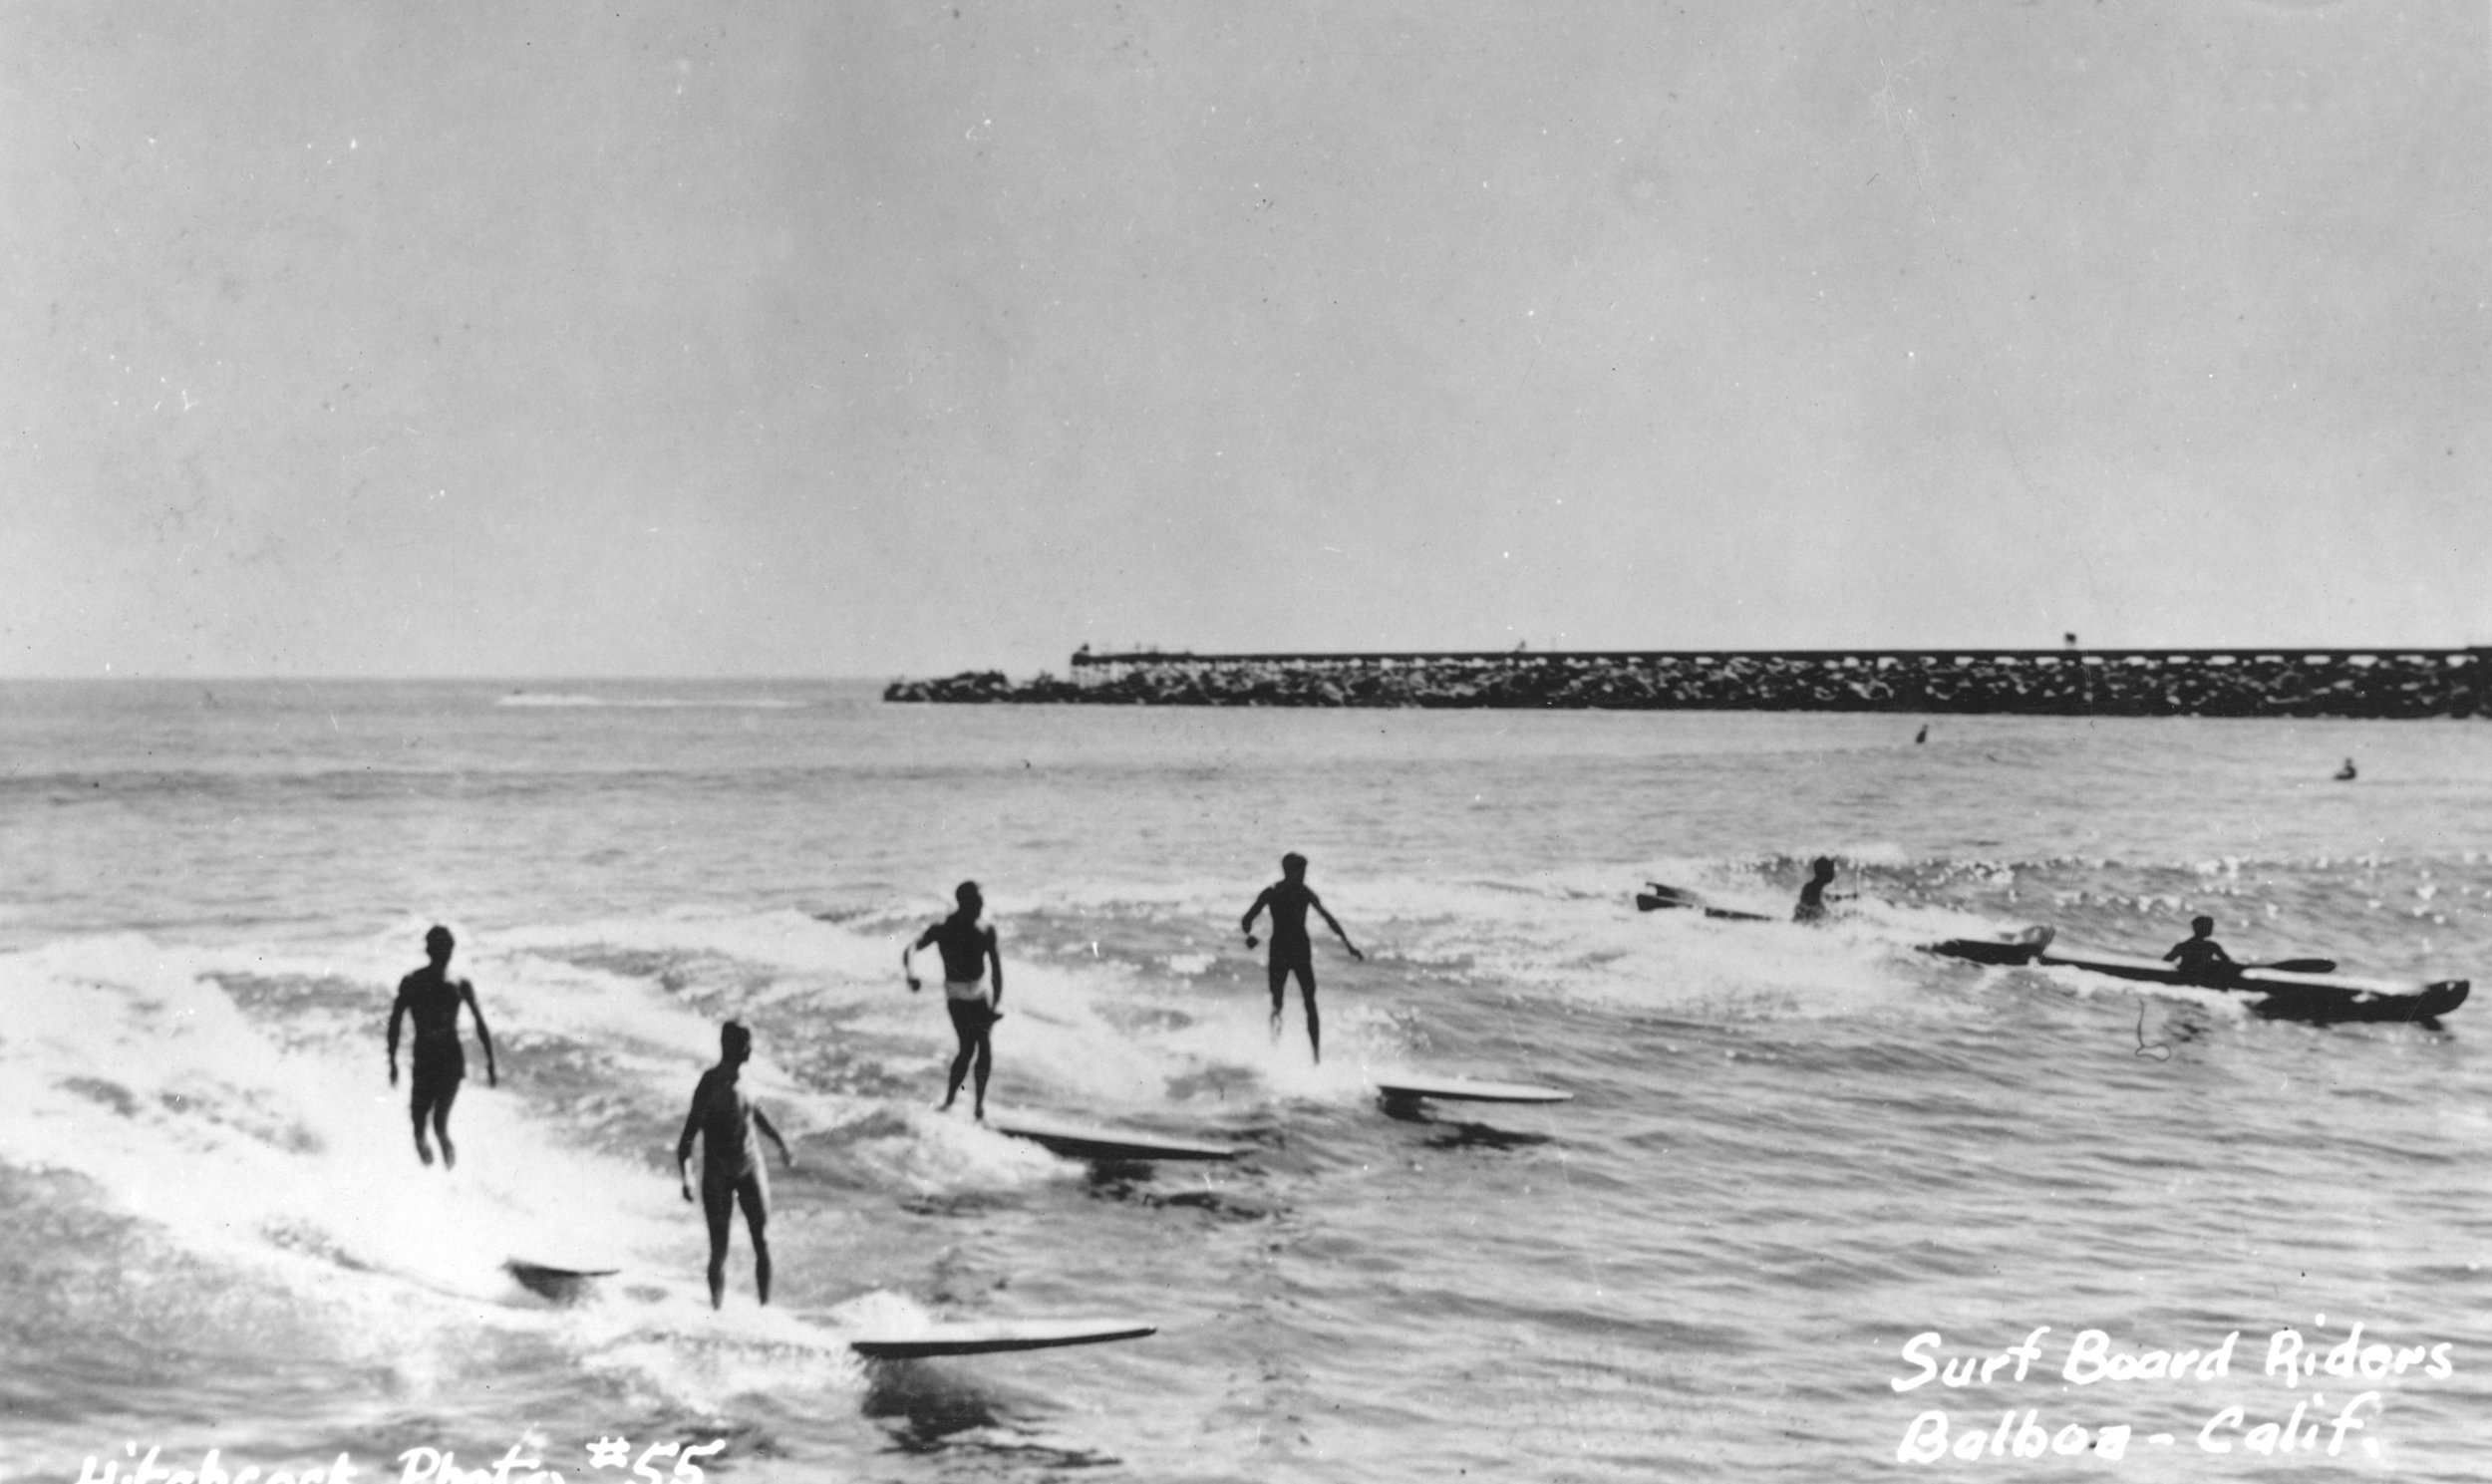 Surfing,_Corona_Del_Mar,_circa_1950s.jpg